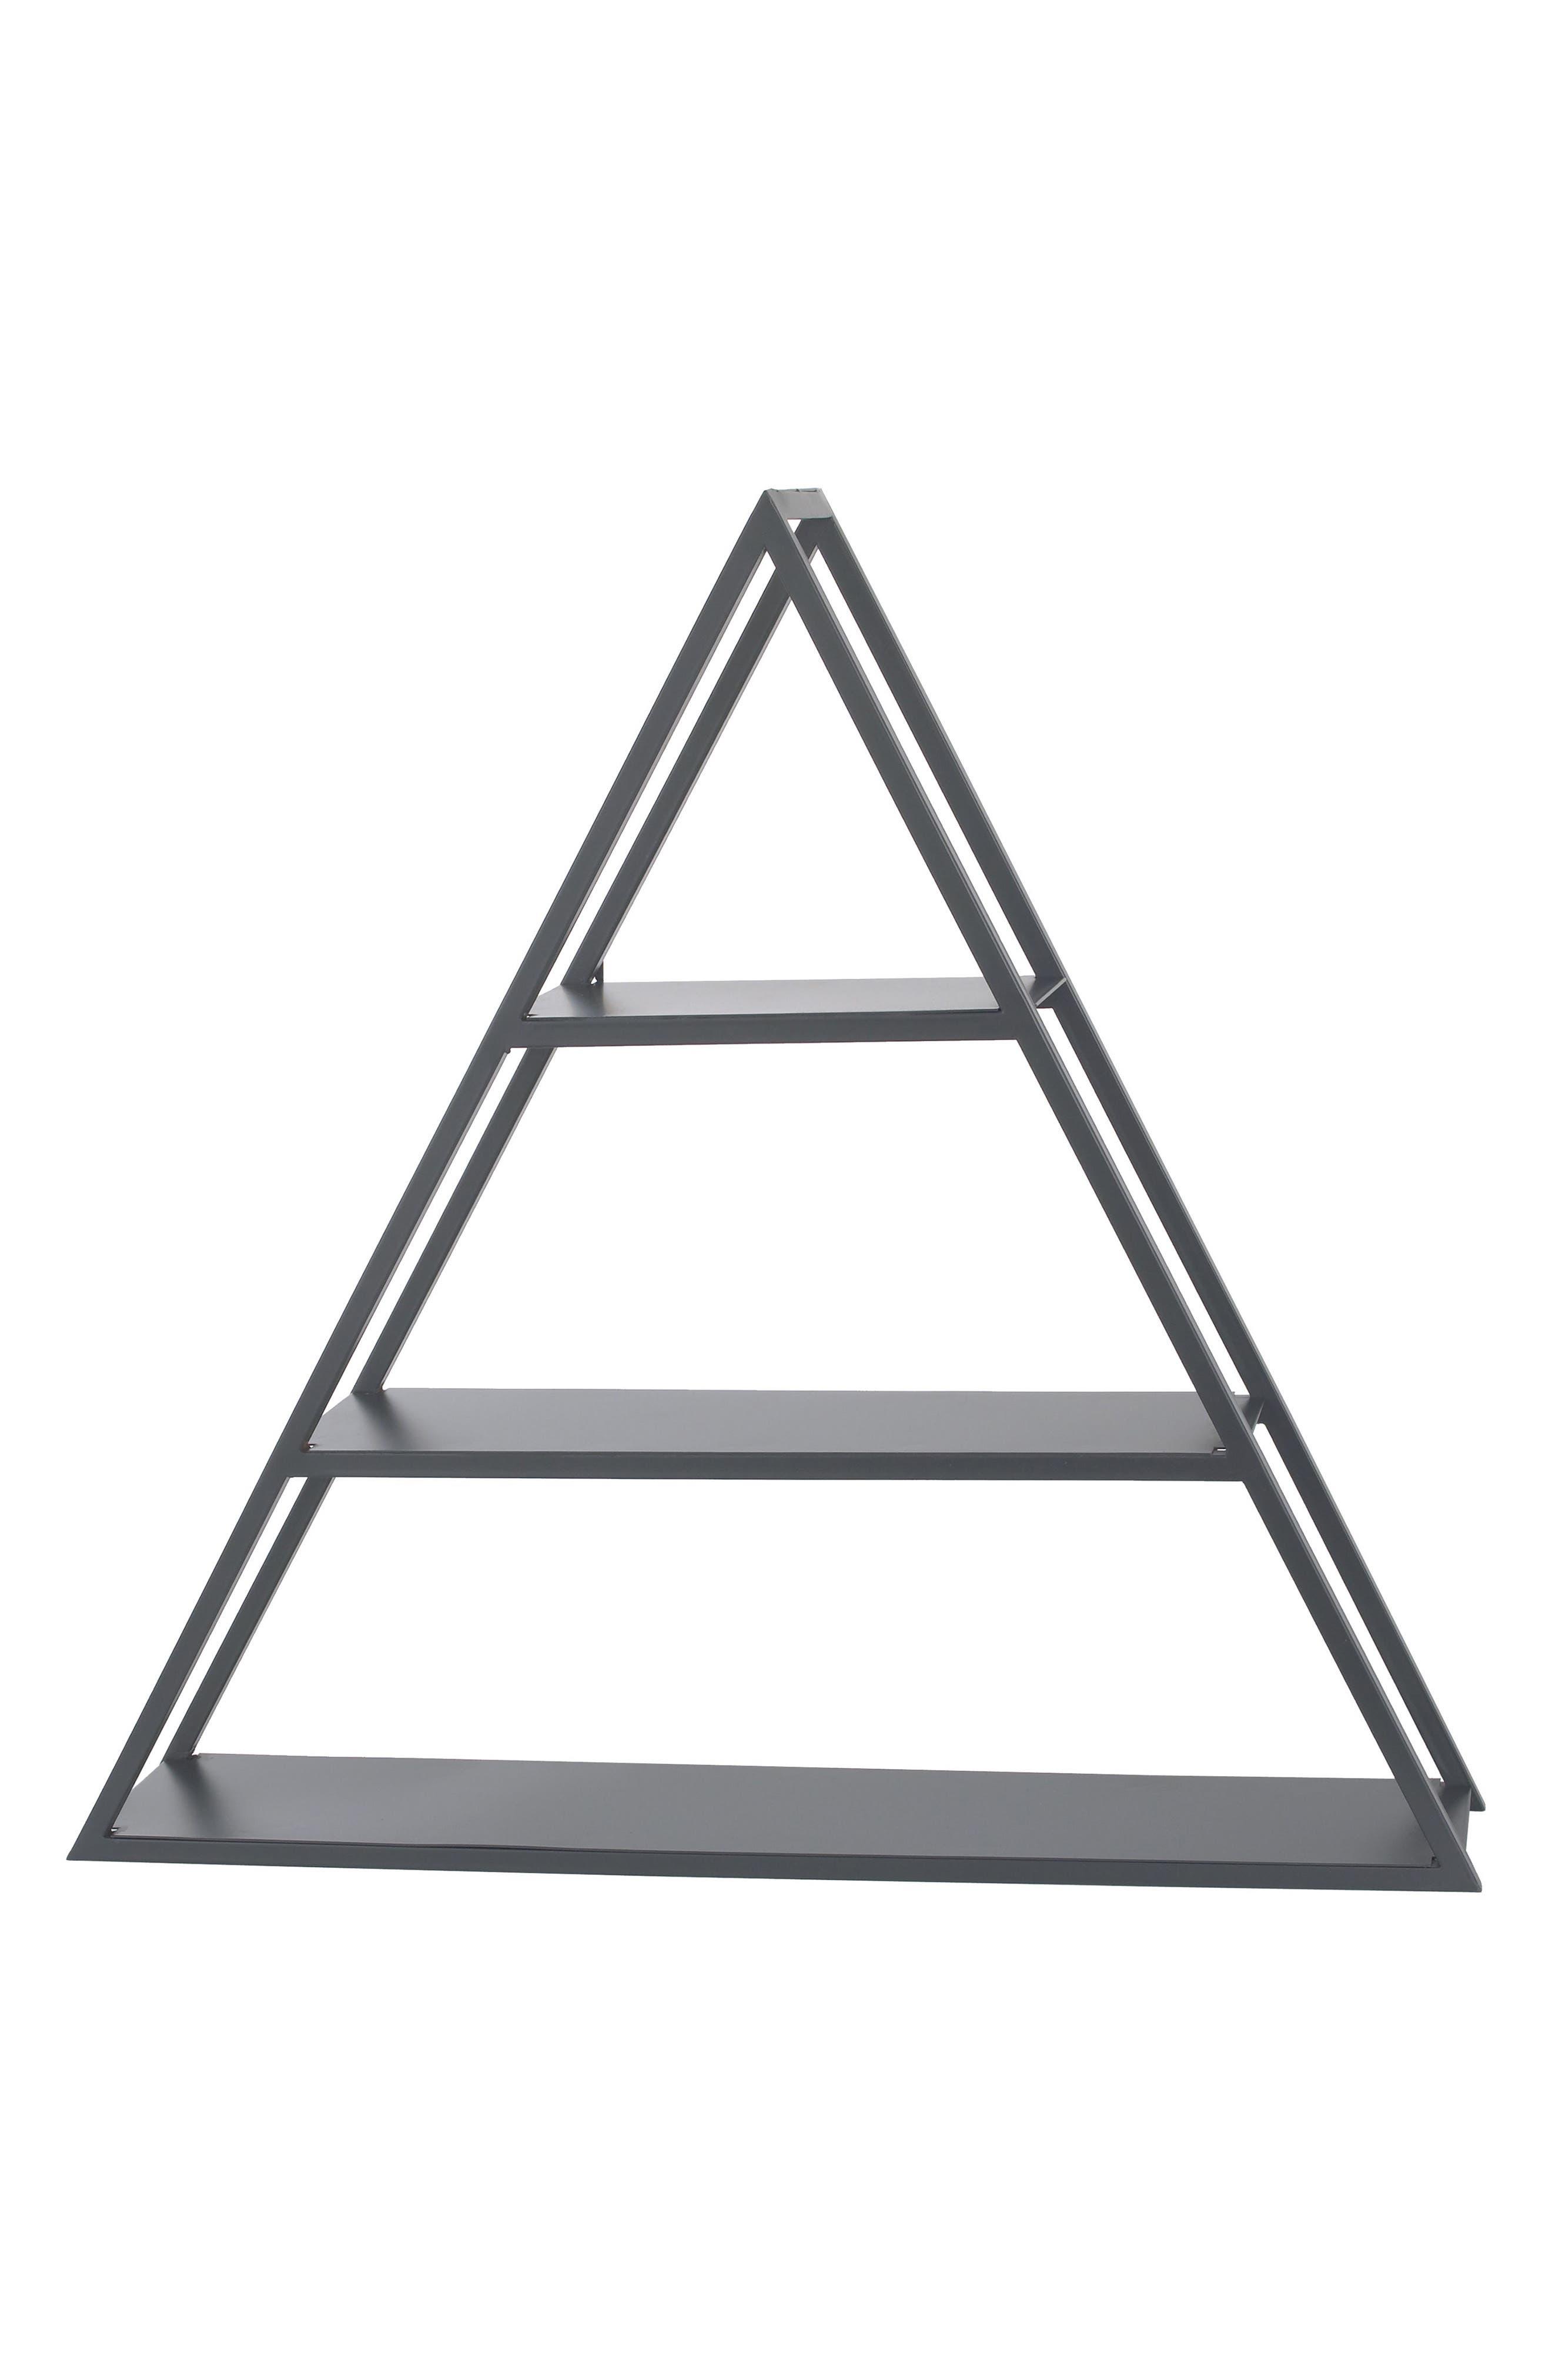 Alternate Image 1 Selected - Petunia Pickle Bottom Metal Triangle Shelf